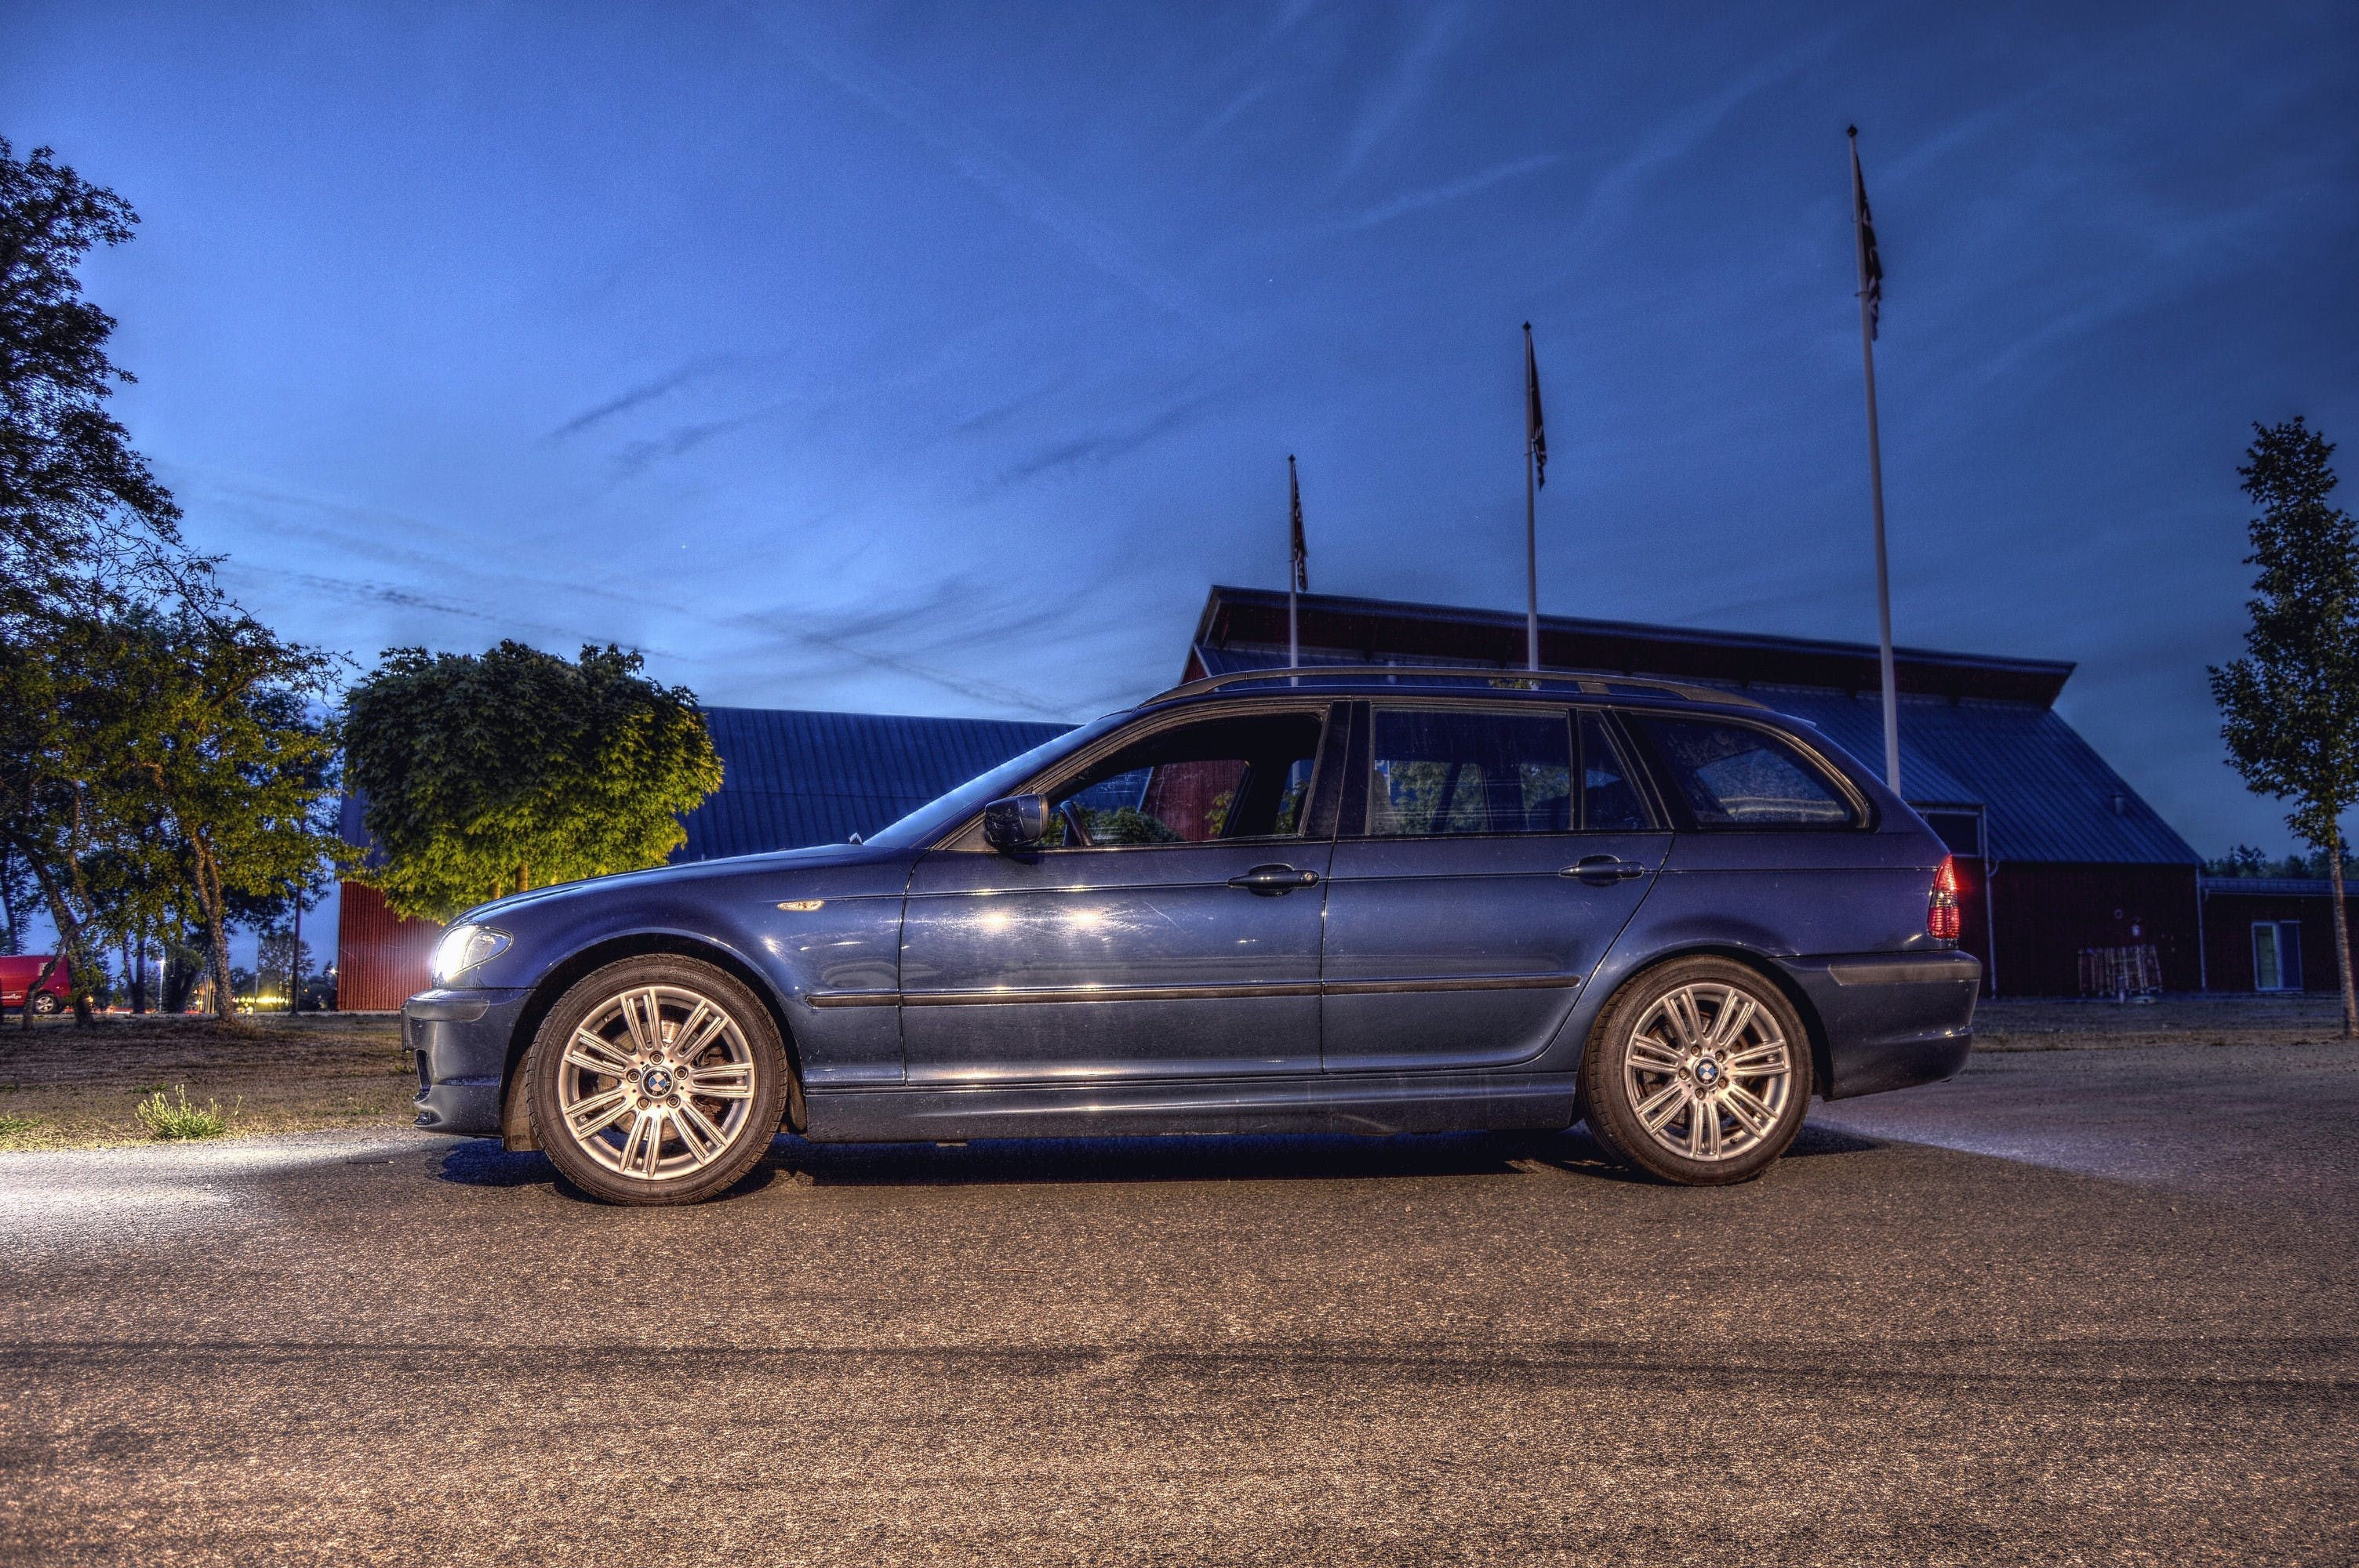 320, auto, blue